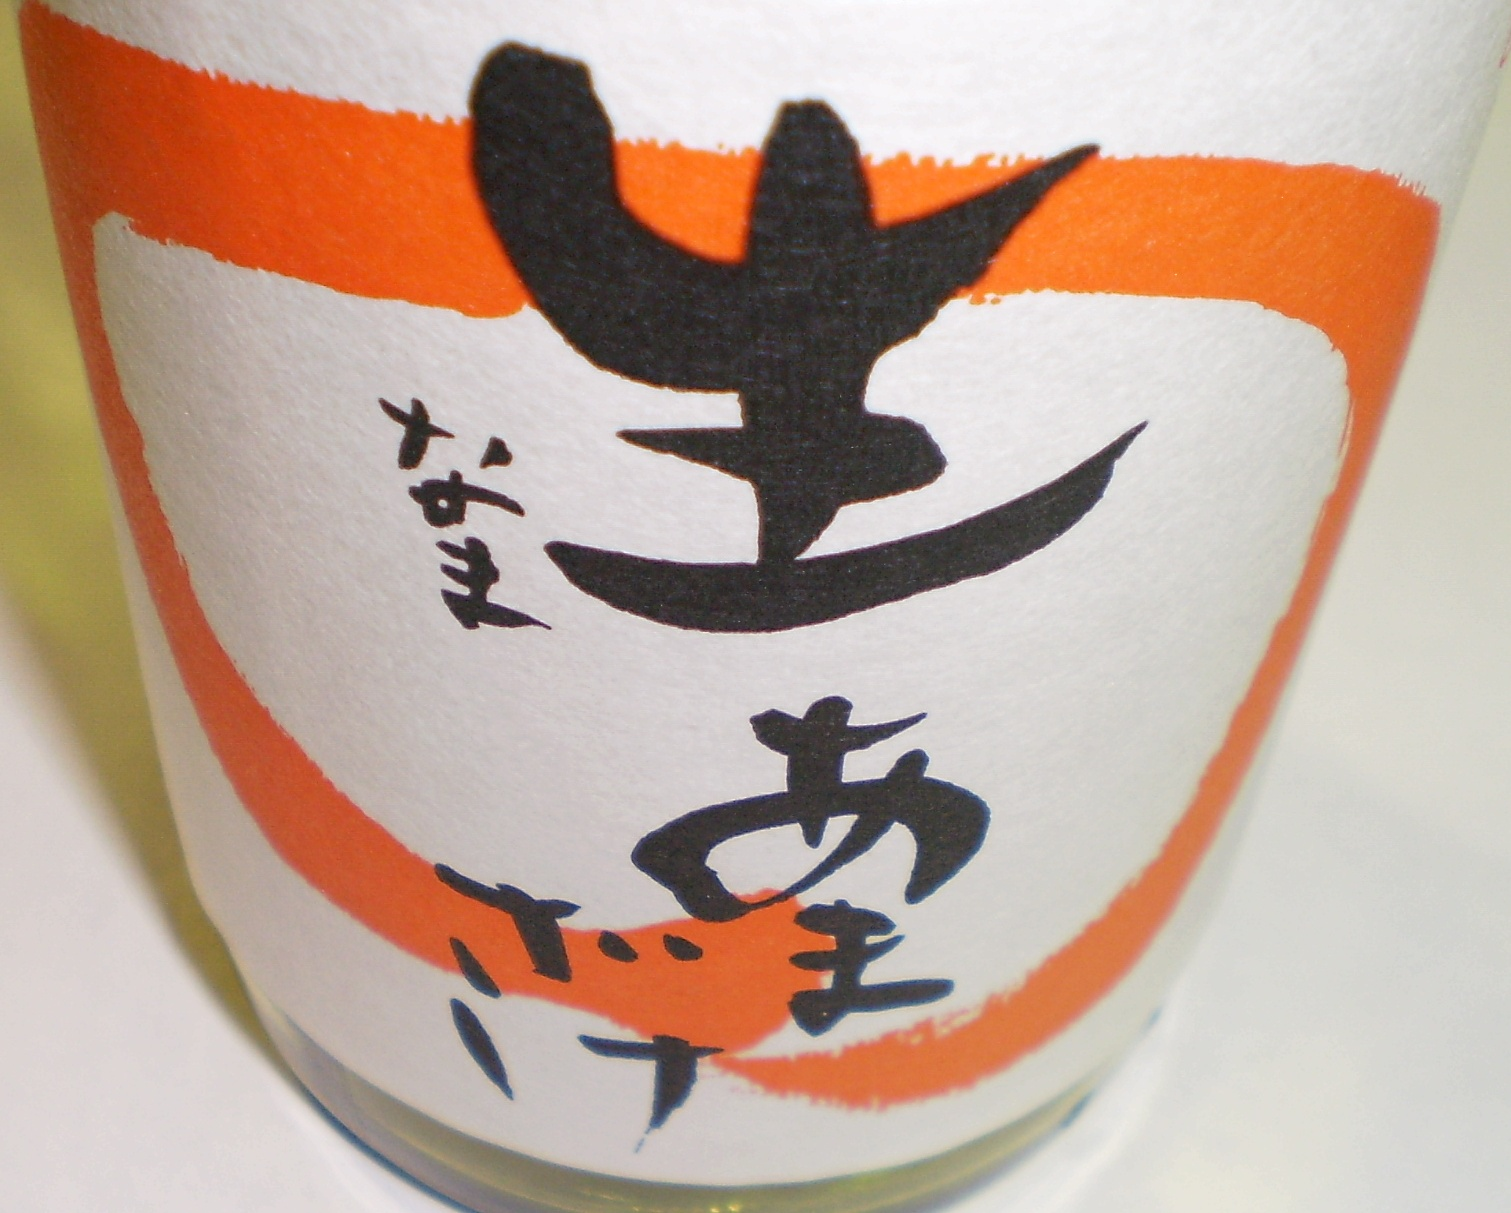 6188_c 【若竹屋酒造】[予約] 生あまざけ 500ml×12本